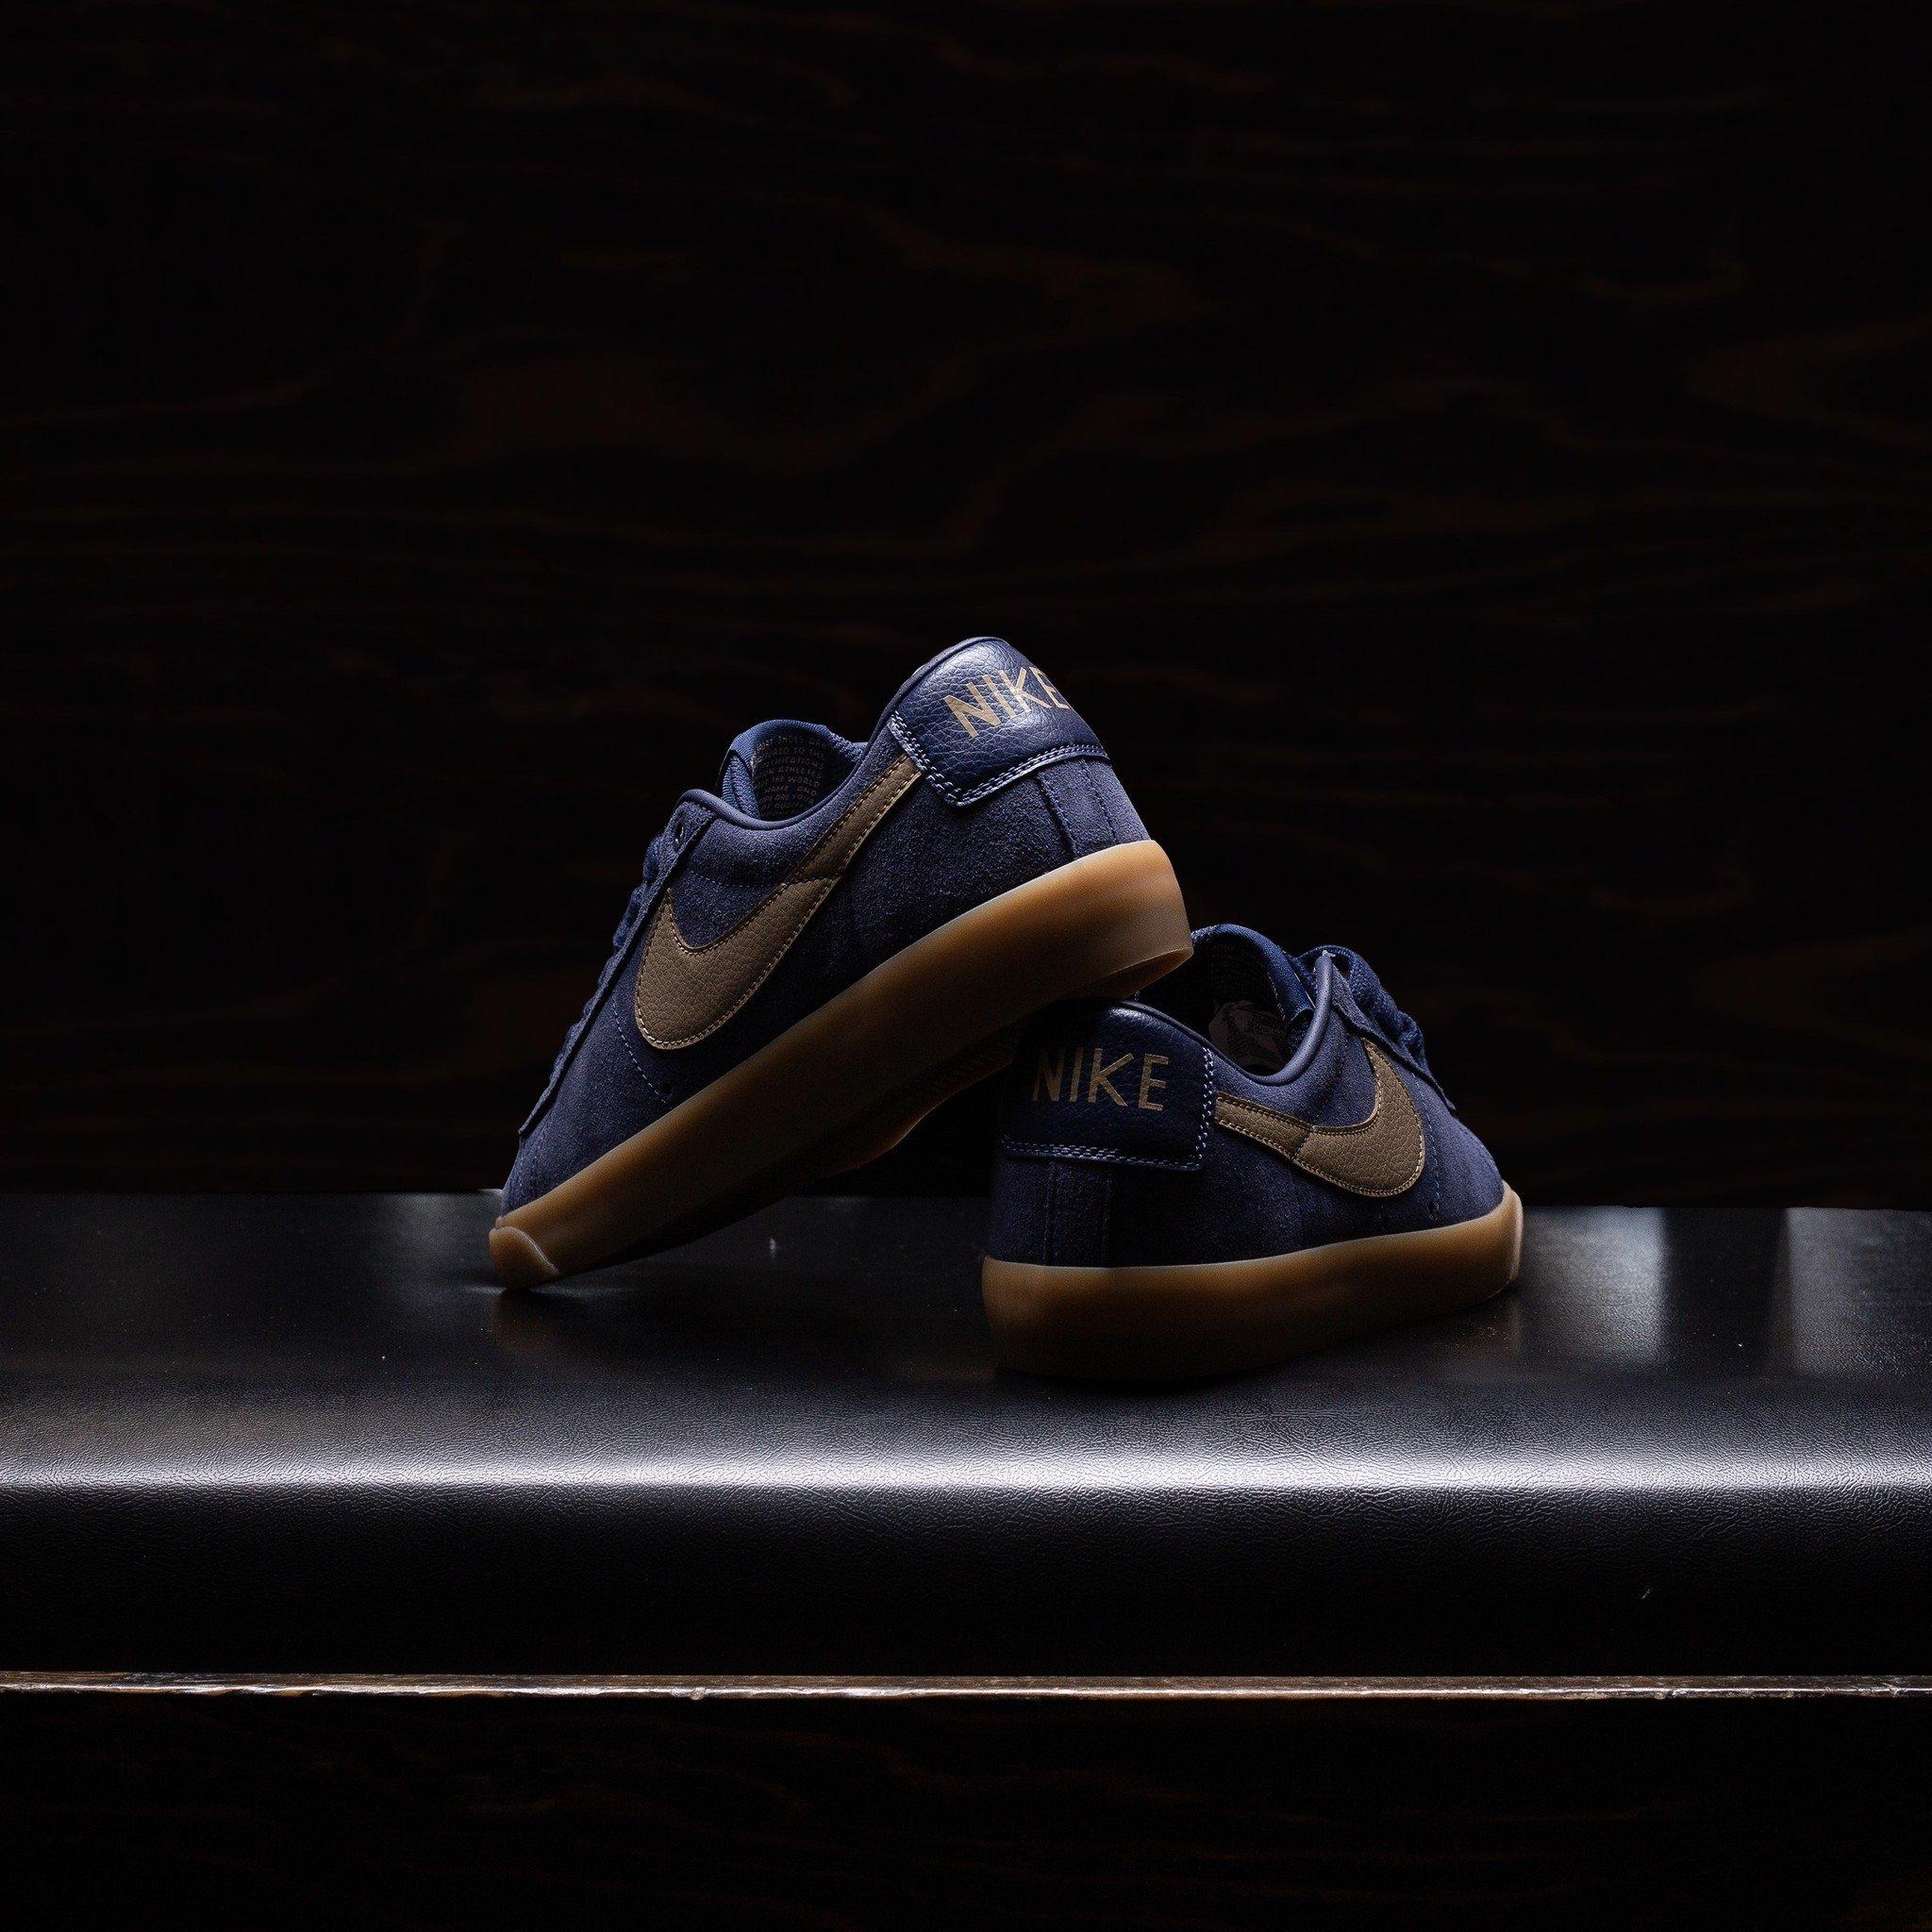 Nike SB Blazer Low GT Midnight Navy/Gum